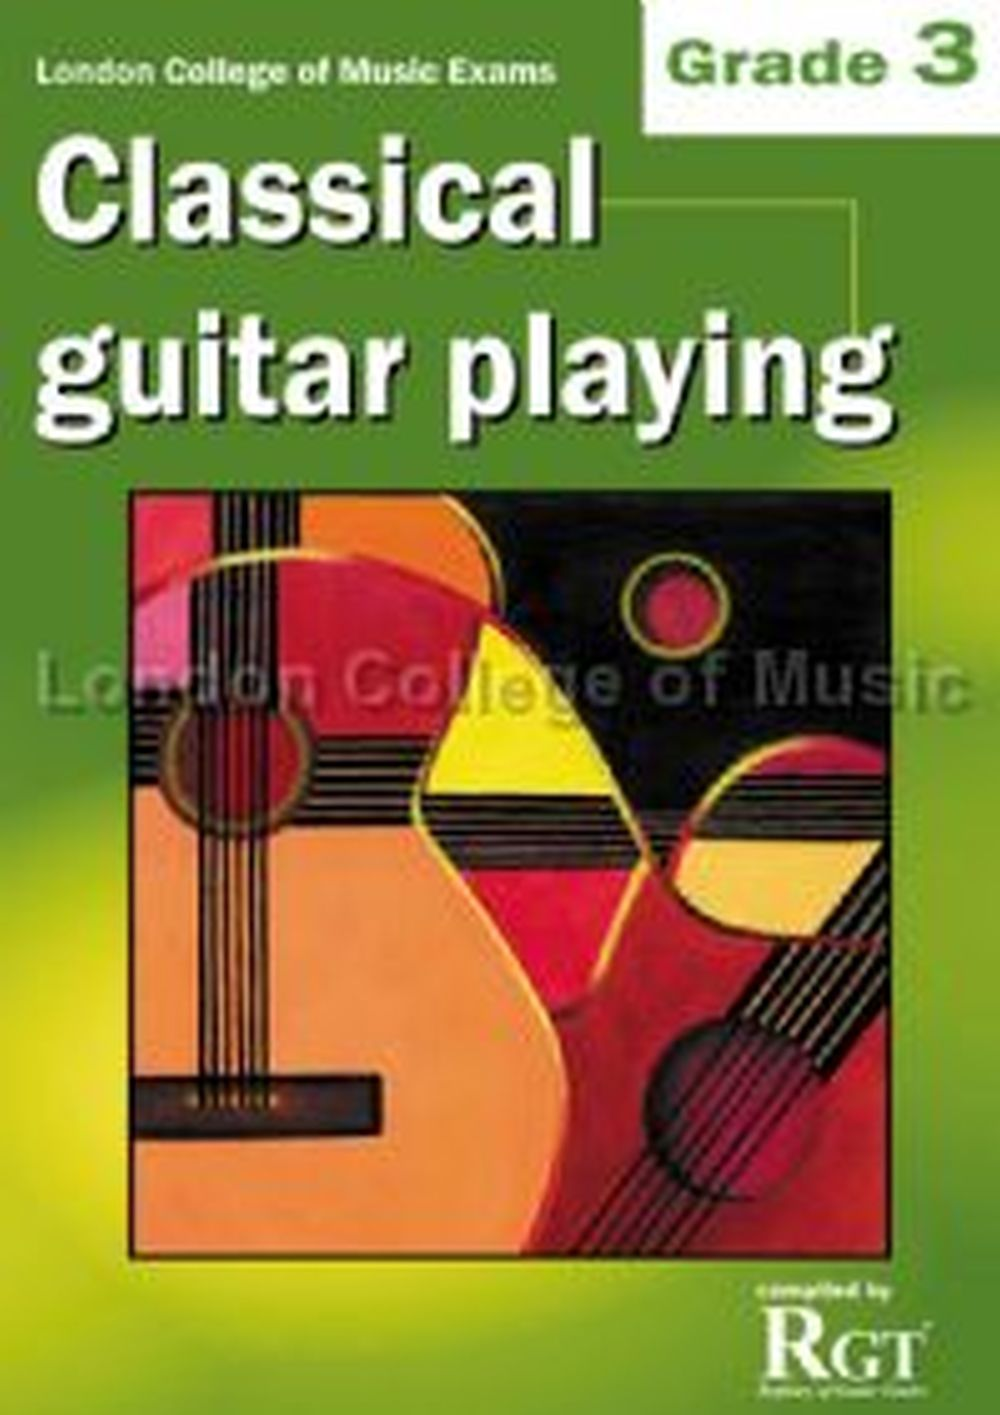 LCM Classical Guitar Playing Grade 3 (2008-2018): Guitar: Instrumental Tutor